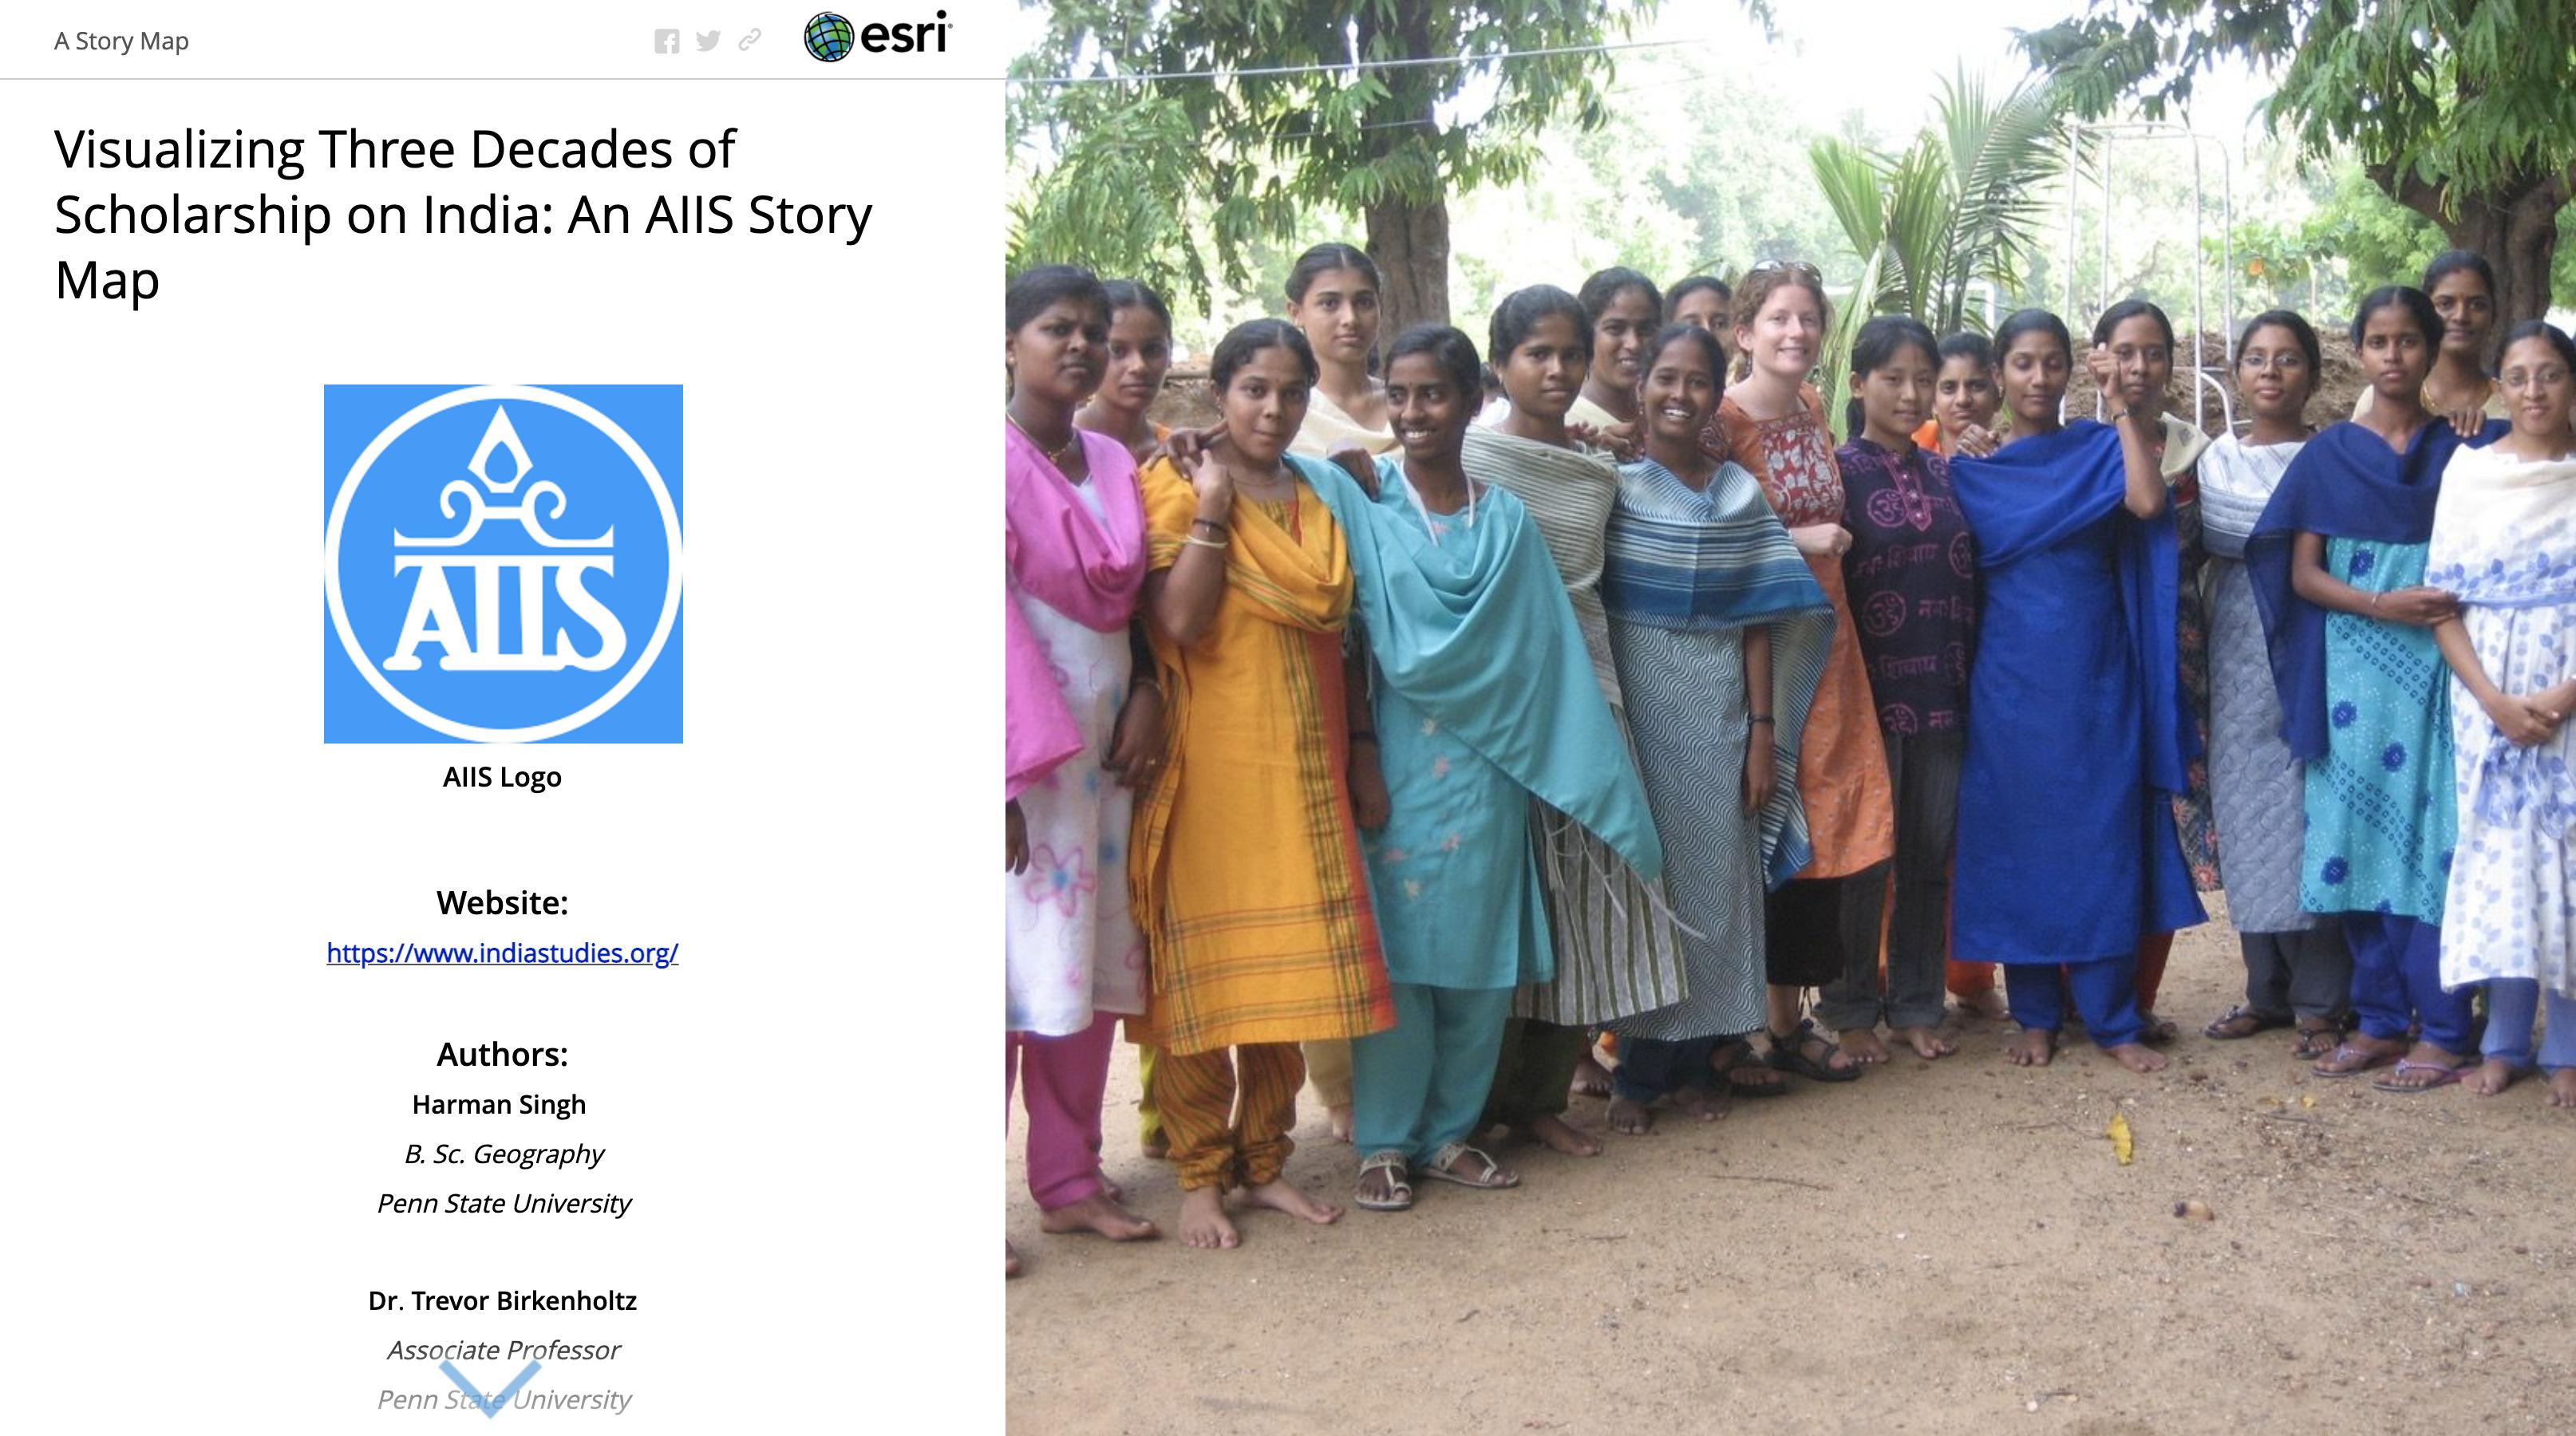 Screenshot of landing page of AIIS ESRI story map